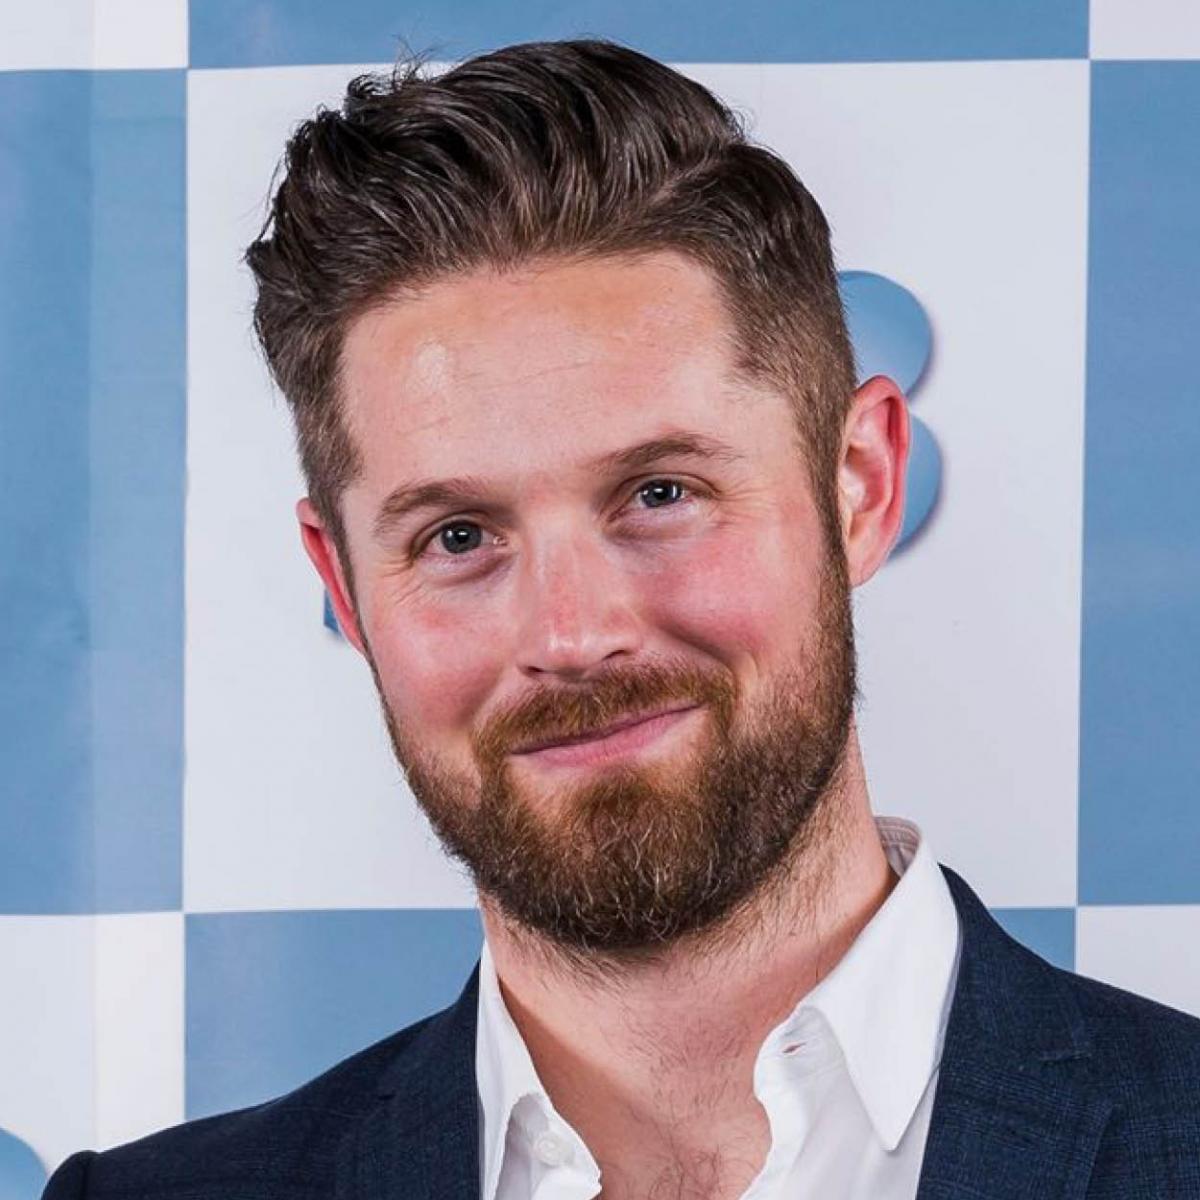 Andreas Hjellegjerde Gründer i YOYN Cowork